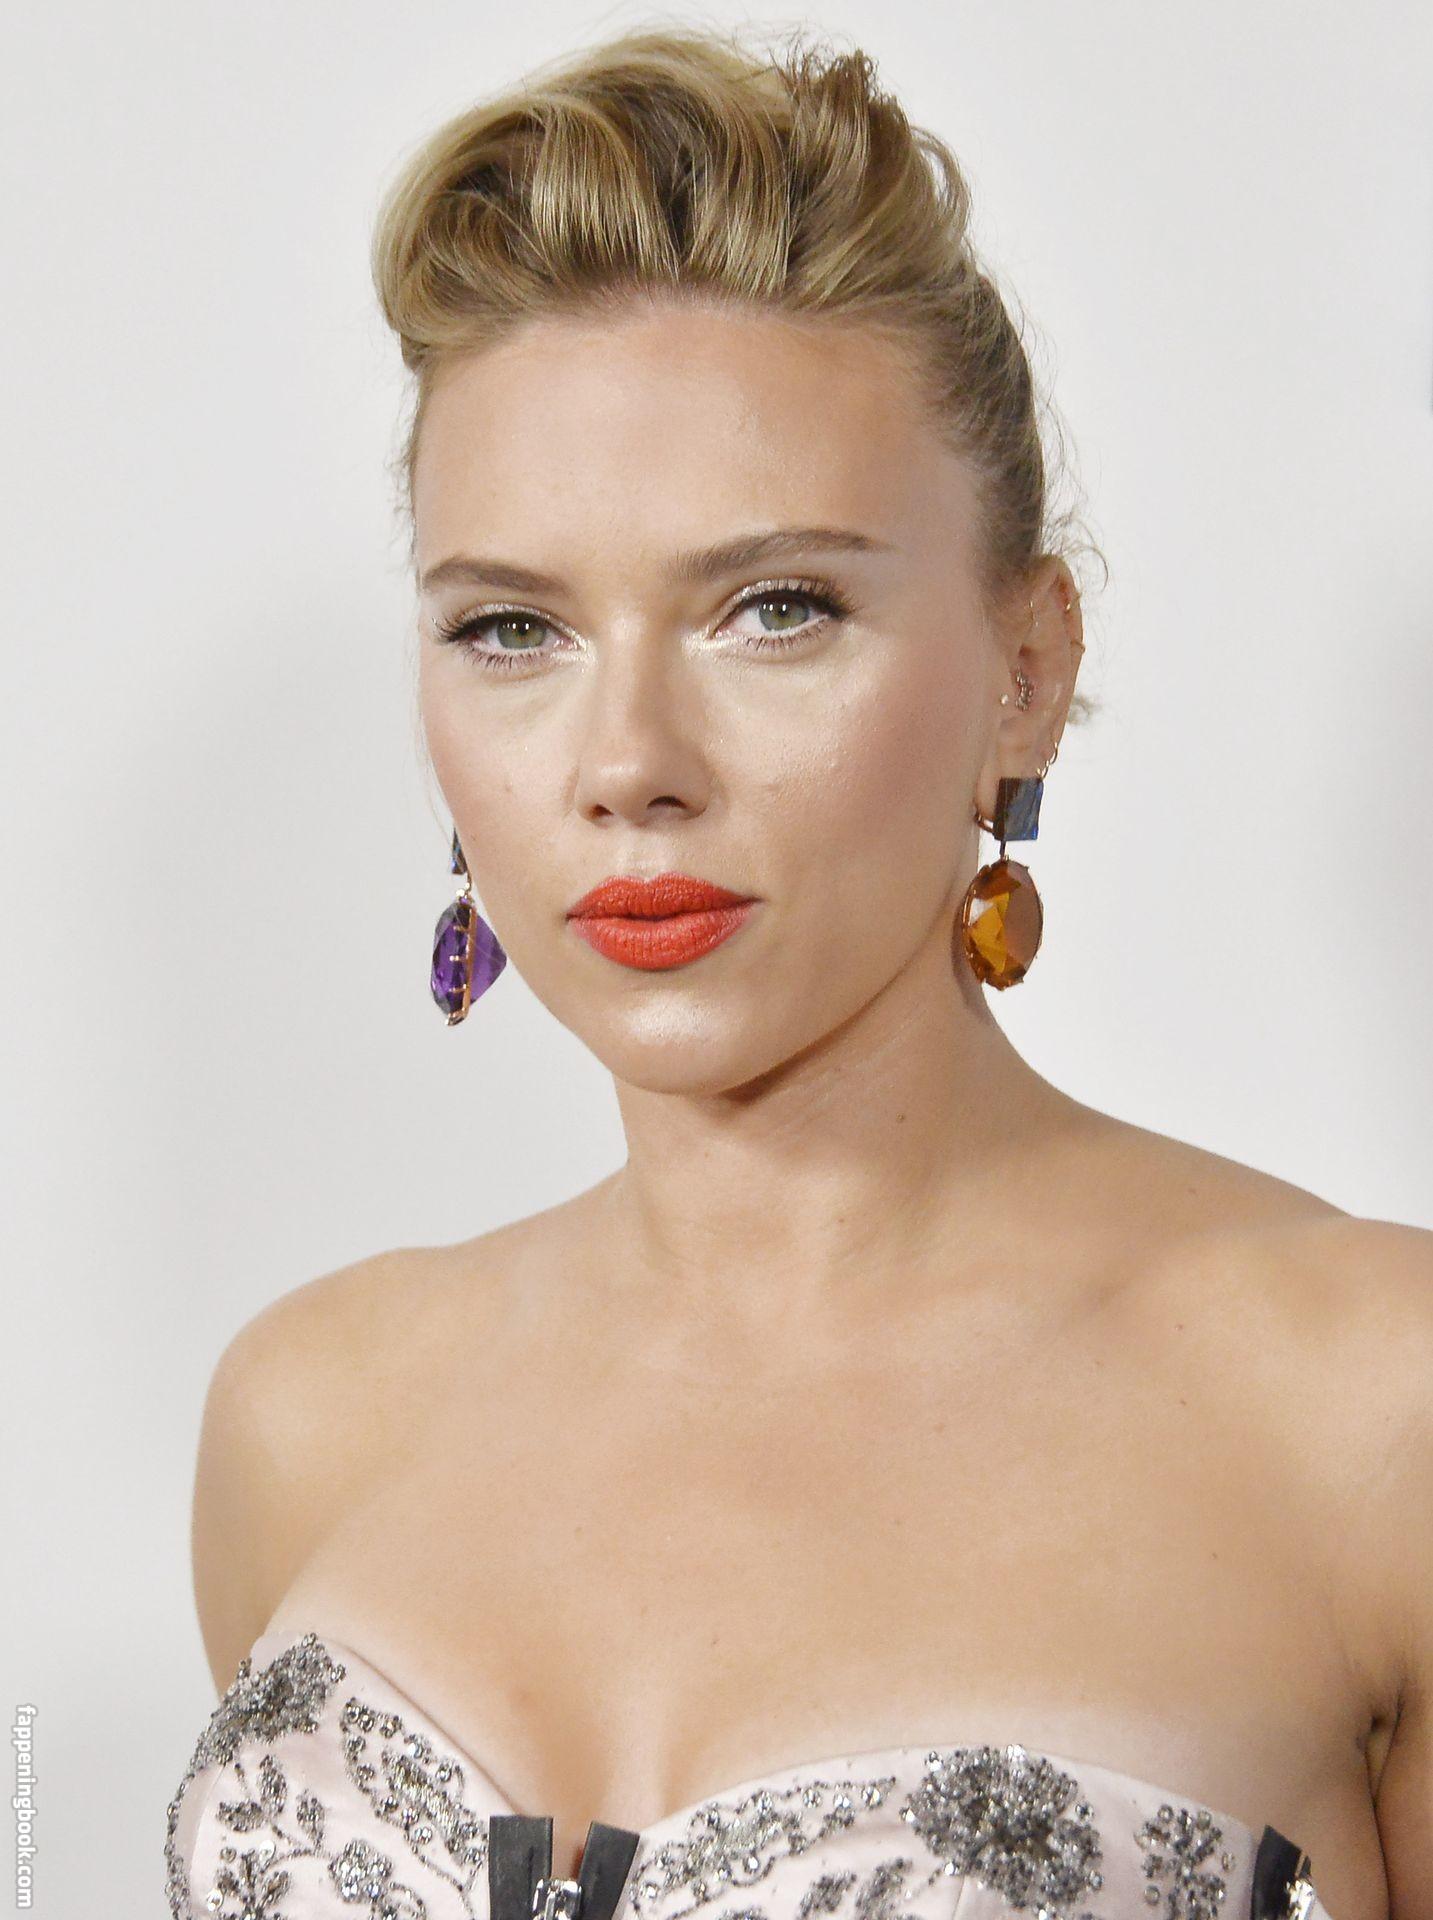 Scarlett Johansson Nude, Sexy, The Fappening, Uncensored